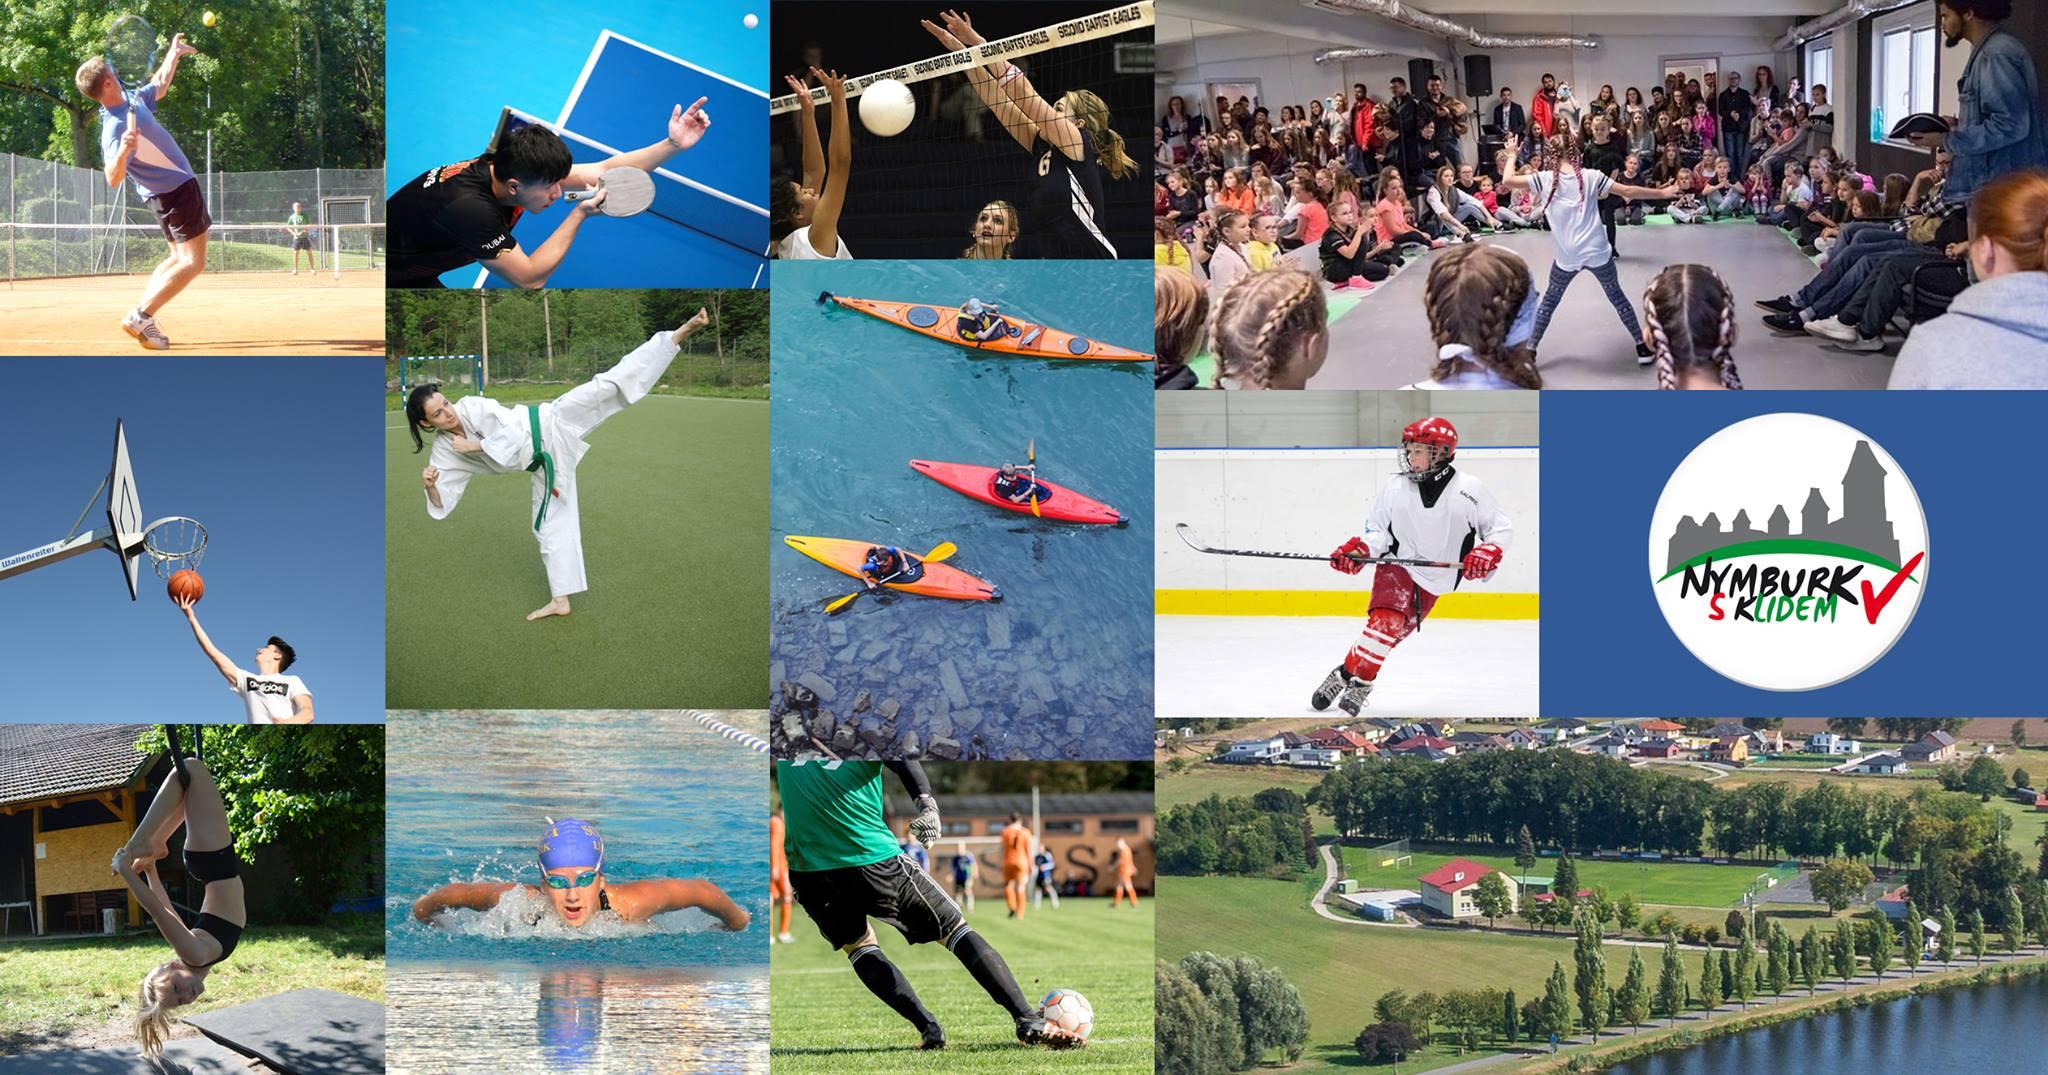 Den pro sport